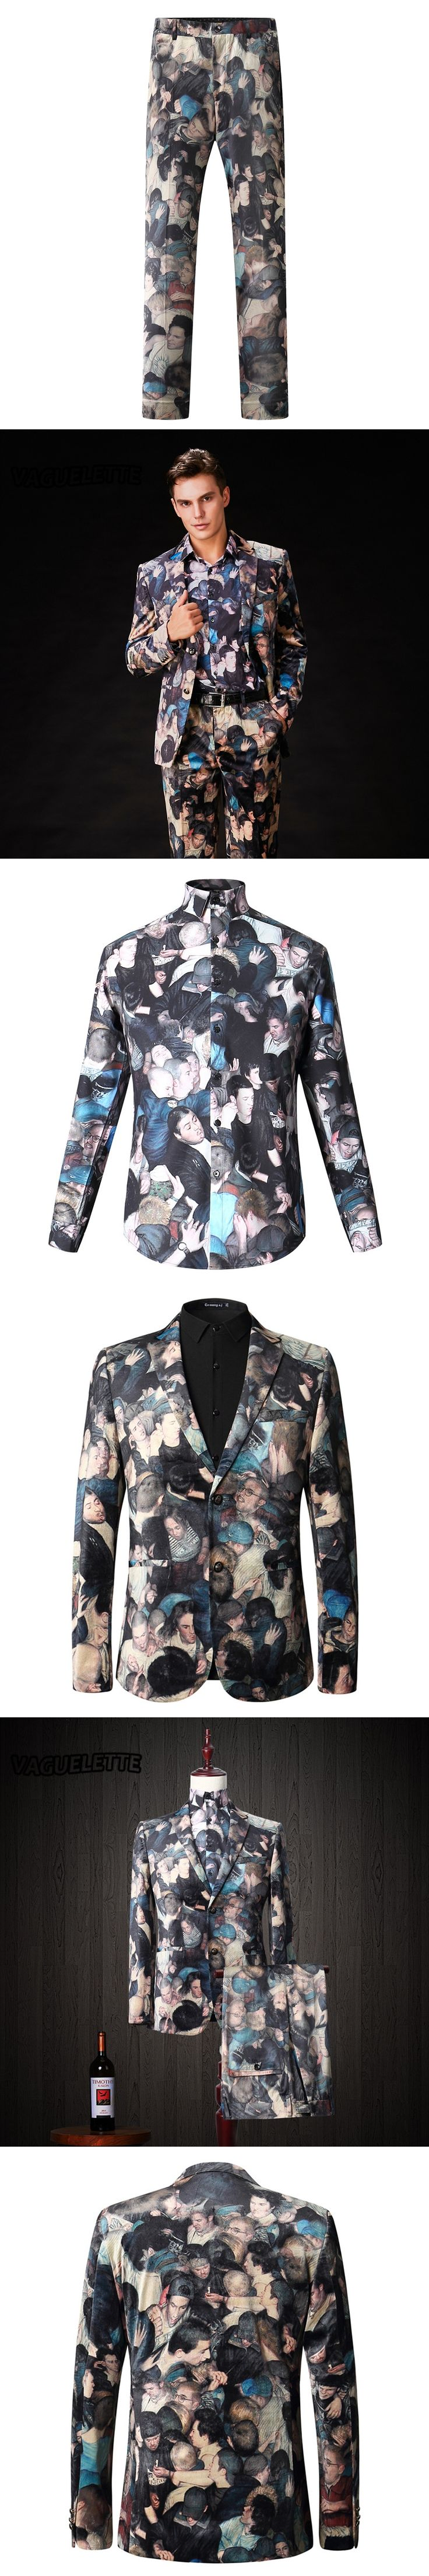 Elegant 3 Piece Suit Slim Fit Wedding Stage Wear 3D Printed Costume Homme Mariage Casual Luxury Mens Suit Italian M-3XL